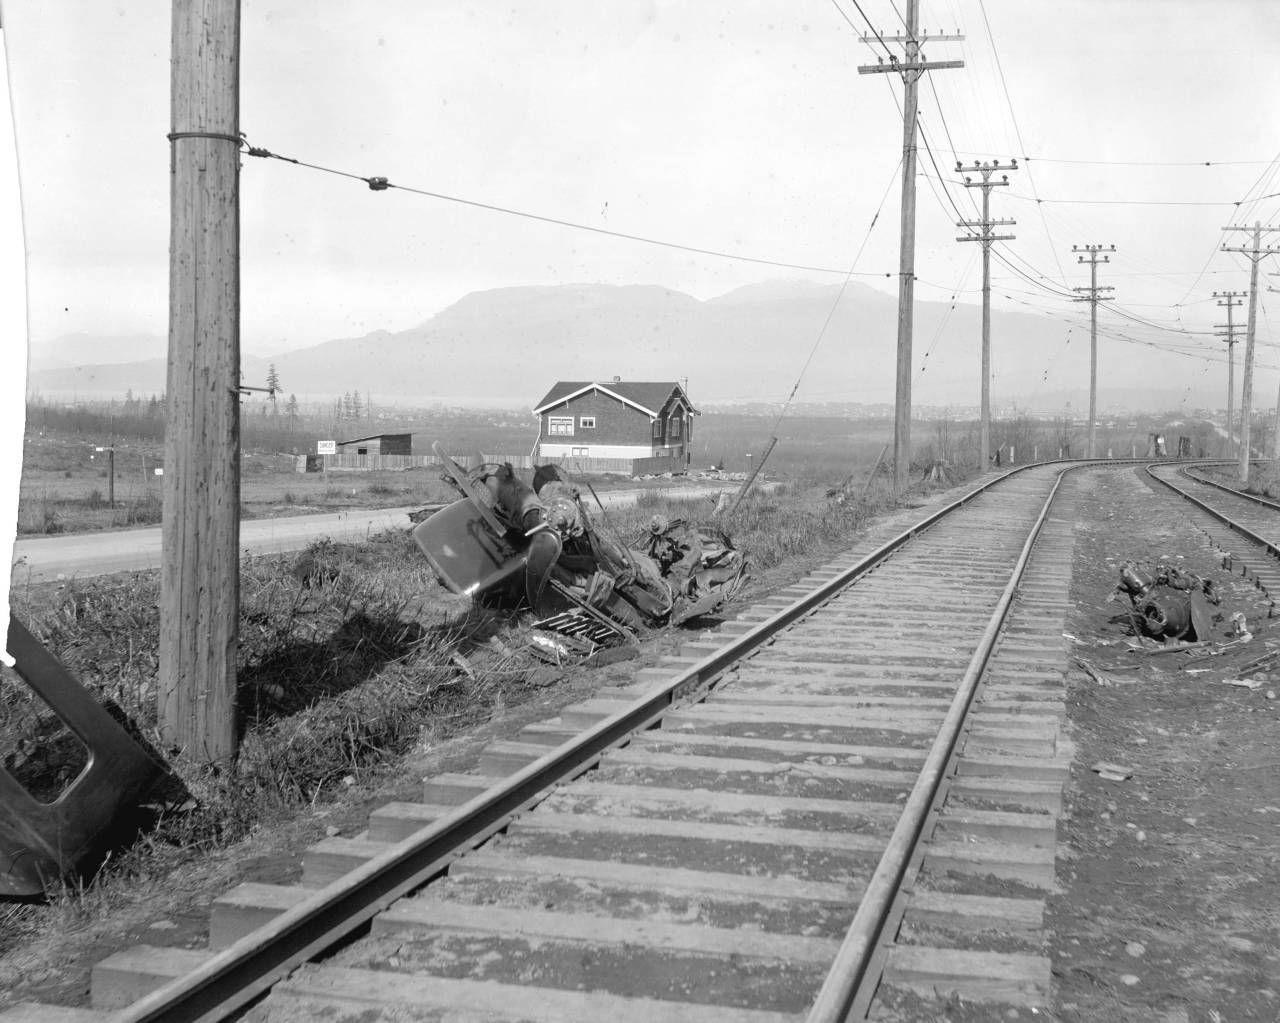 Car wreck kerrisdale march 1920 j hanbum and goodwin